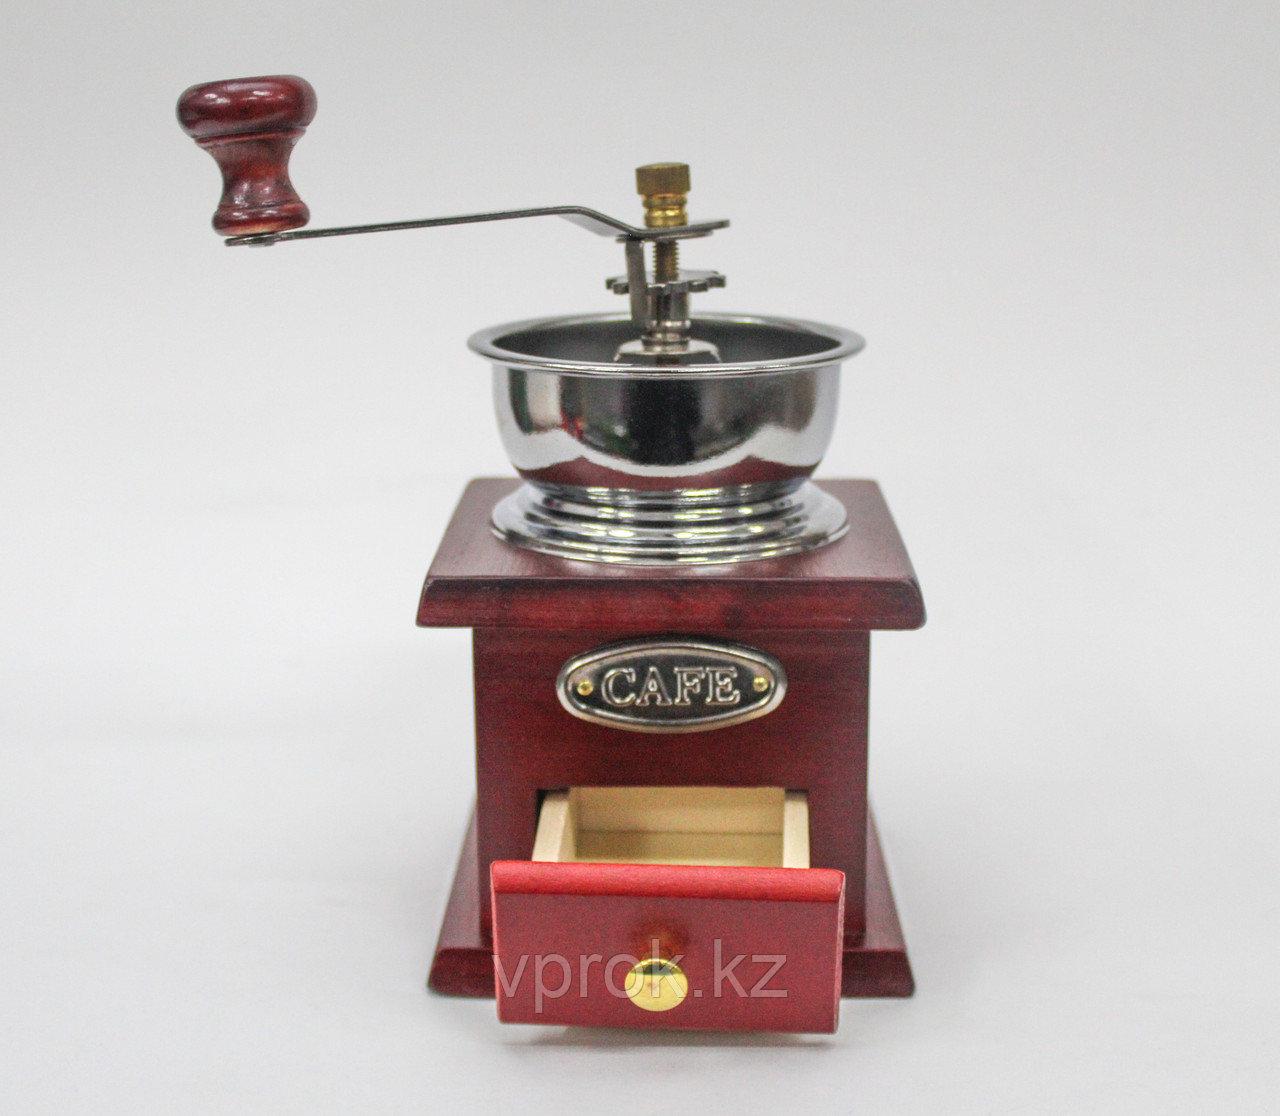 Кофемолка ручная, красное дерево, 30x25x30см - фото 2